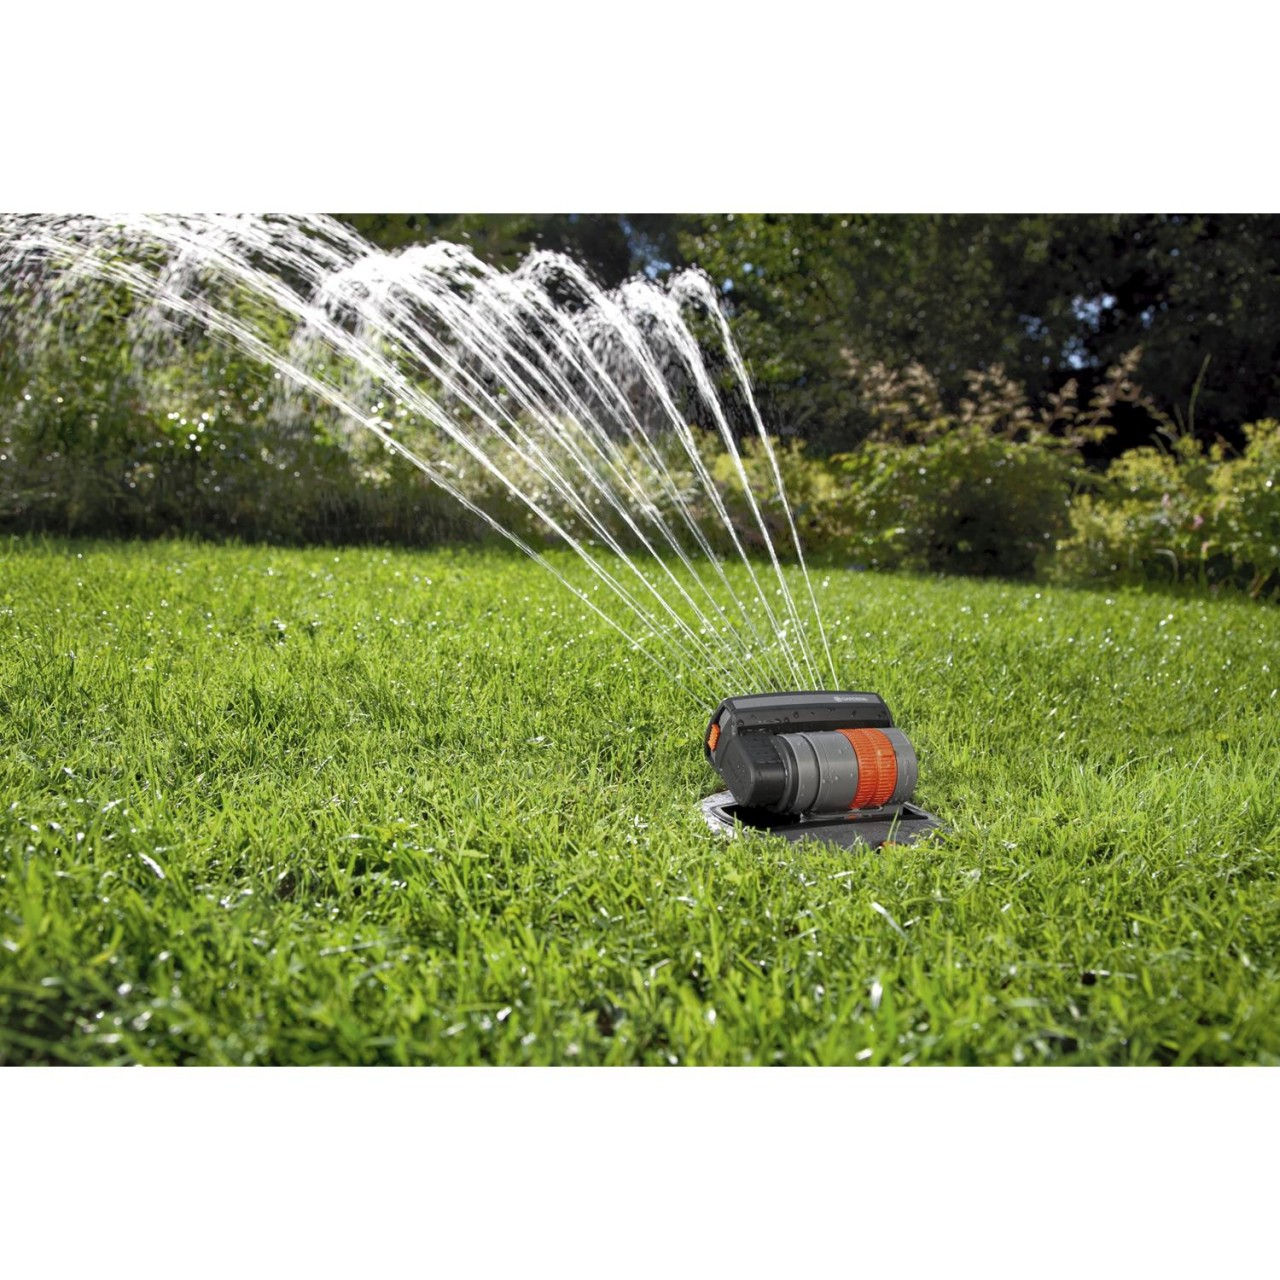 Gardena Sprinklersystem OS 140 Versenk-Viereckregner 8223-20